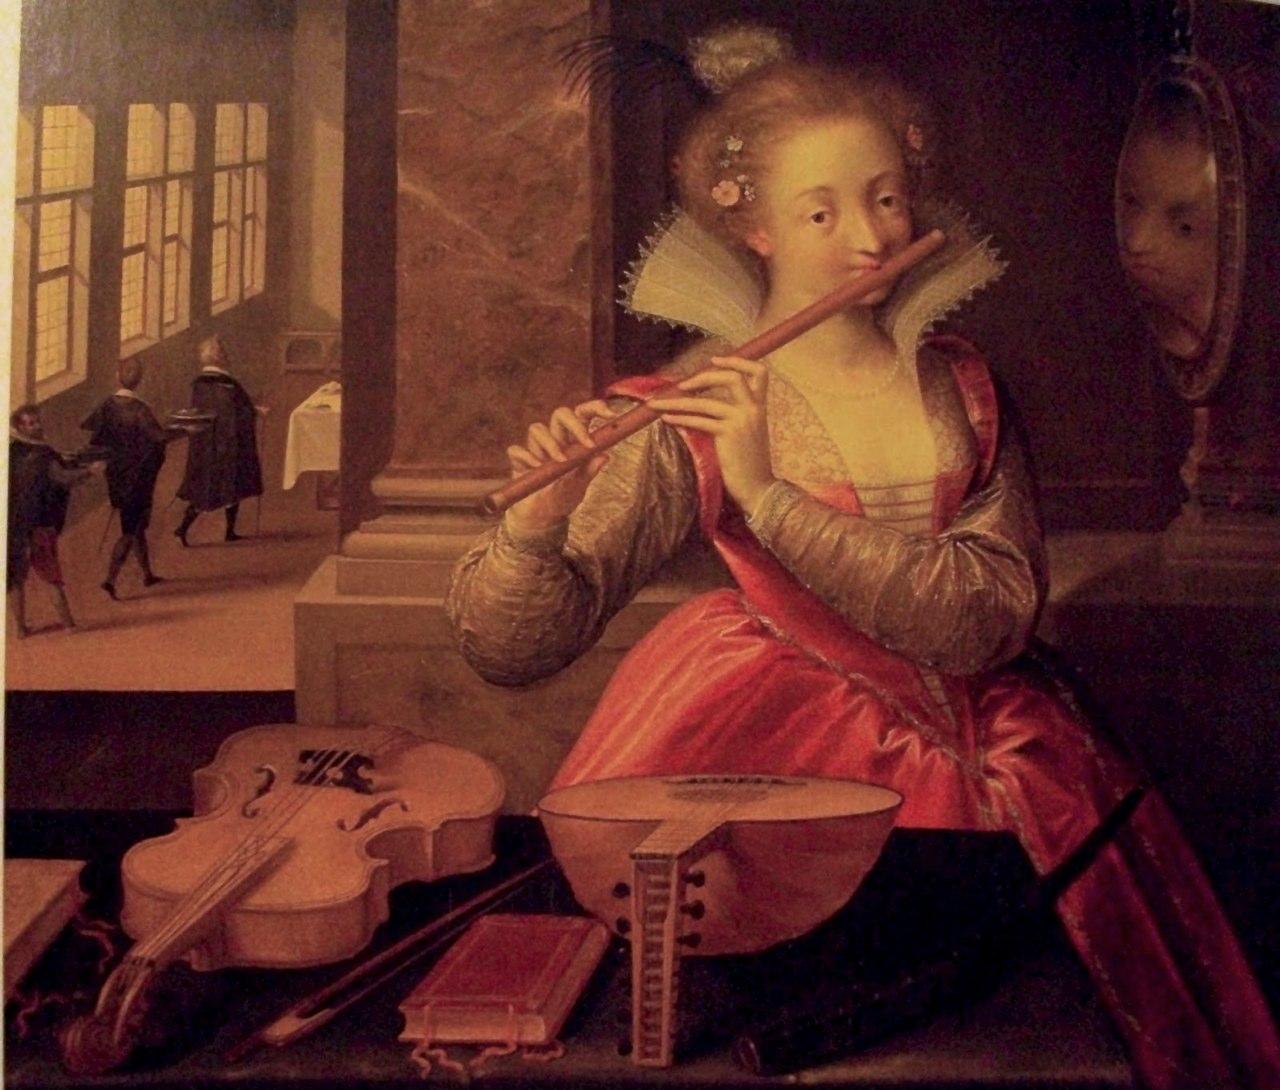 Dirk de Quade van Ravesteyn (f. 1589-1619). Allegory of Music (Die Flötenspielerin), ca. 1600. Vienna, Kunsthistorisches Museum. Contributed by Josué Melendez.